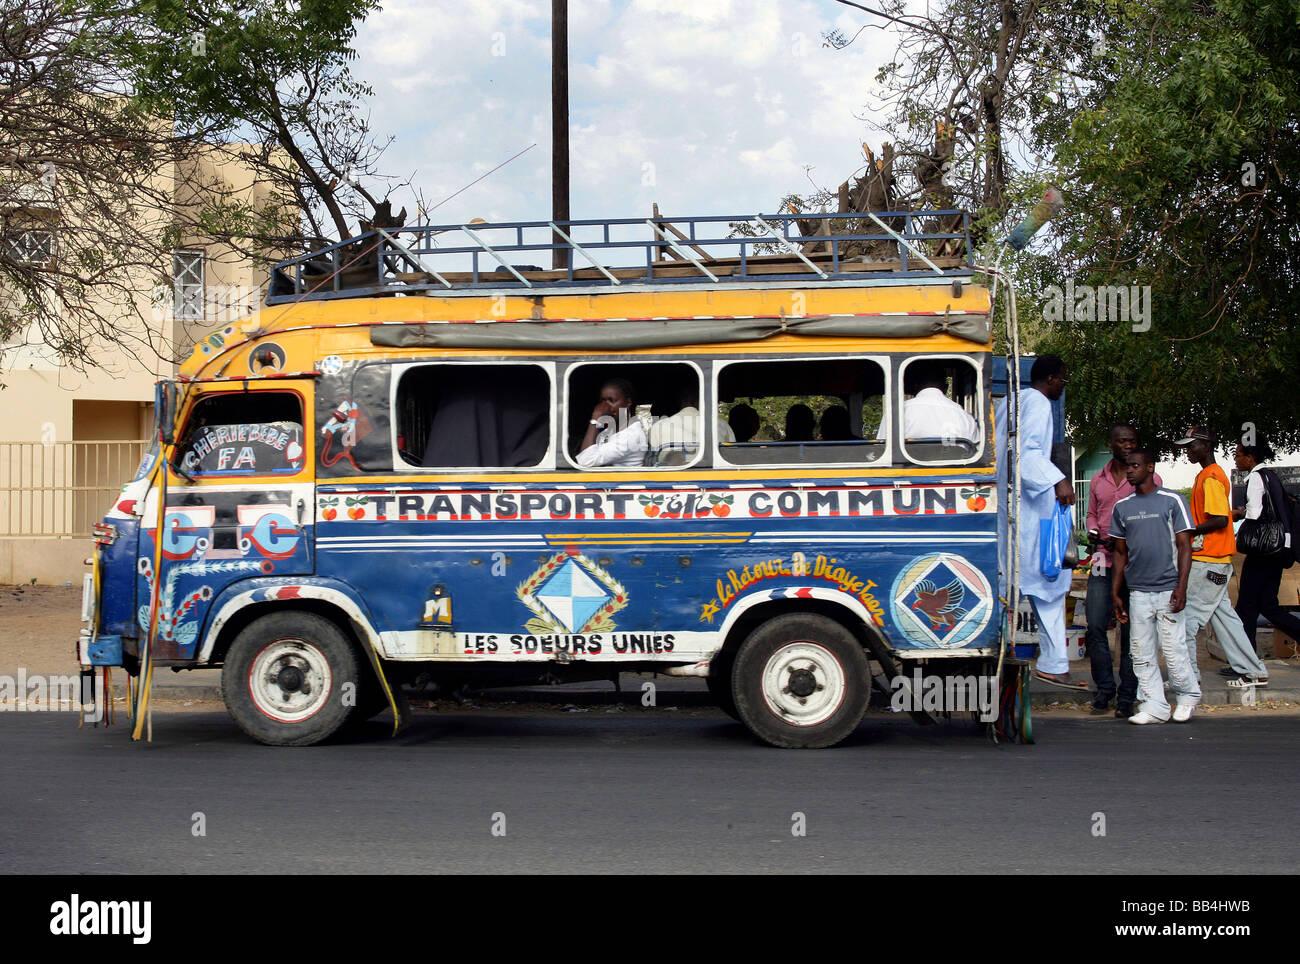 Sénégal, Dakar: bus des transports publics Photo Stock